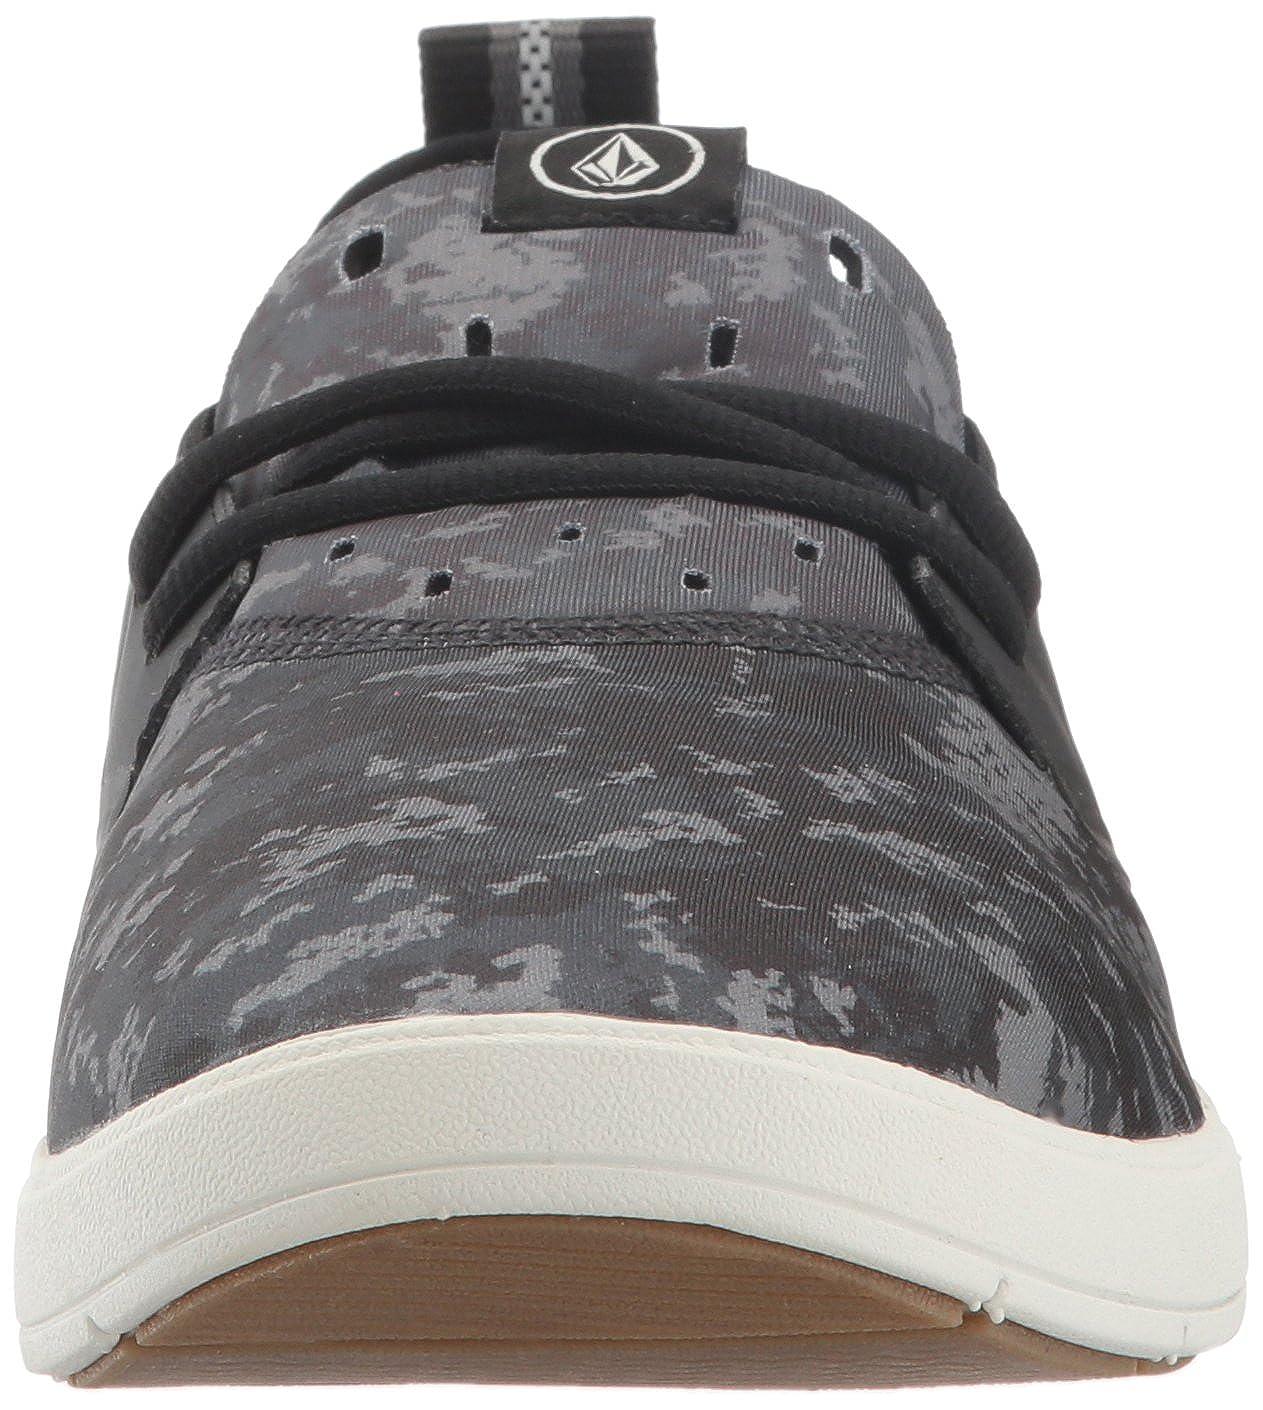 fbe7e7db65b2 Amazon.com  Volcom Men s Draft Water Shoe Sandal  Shoes